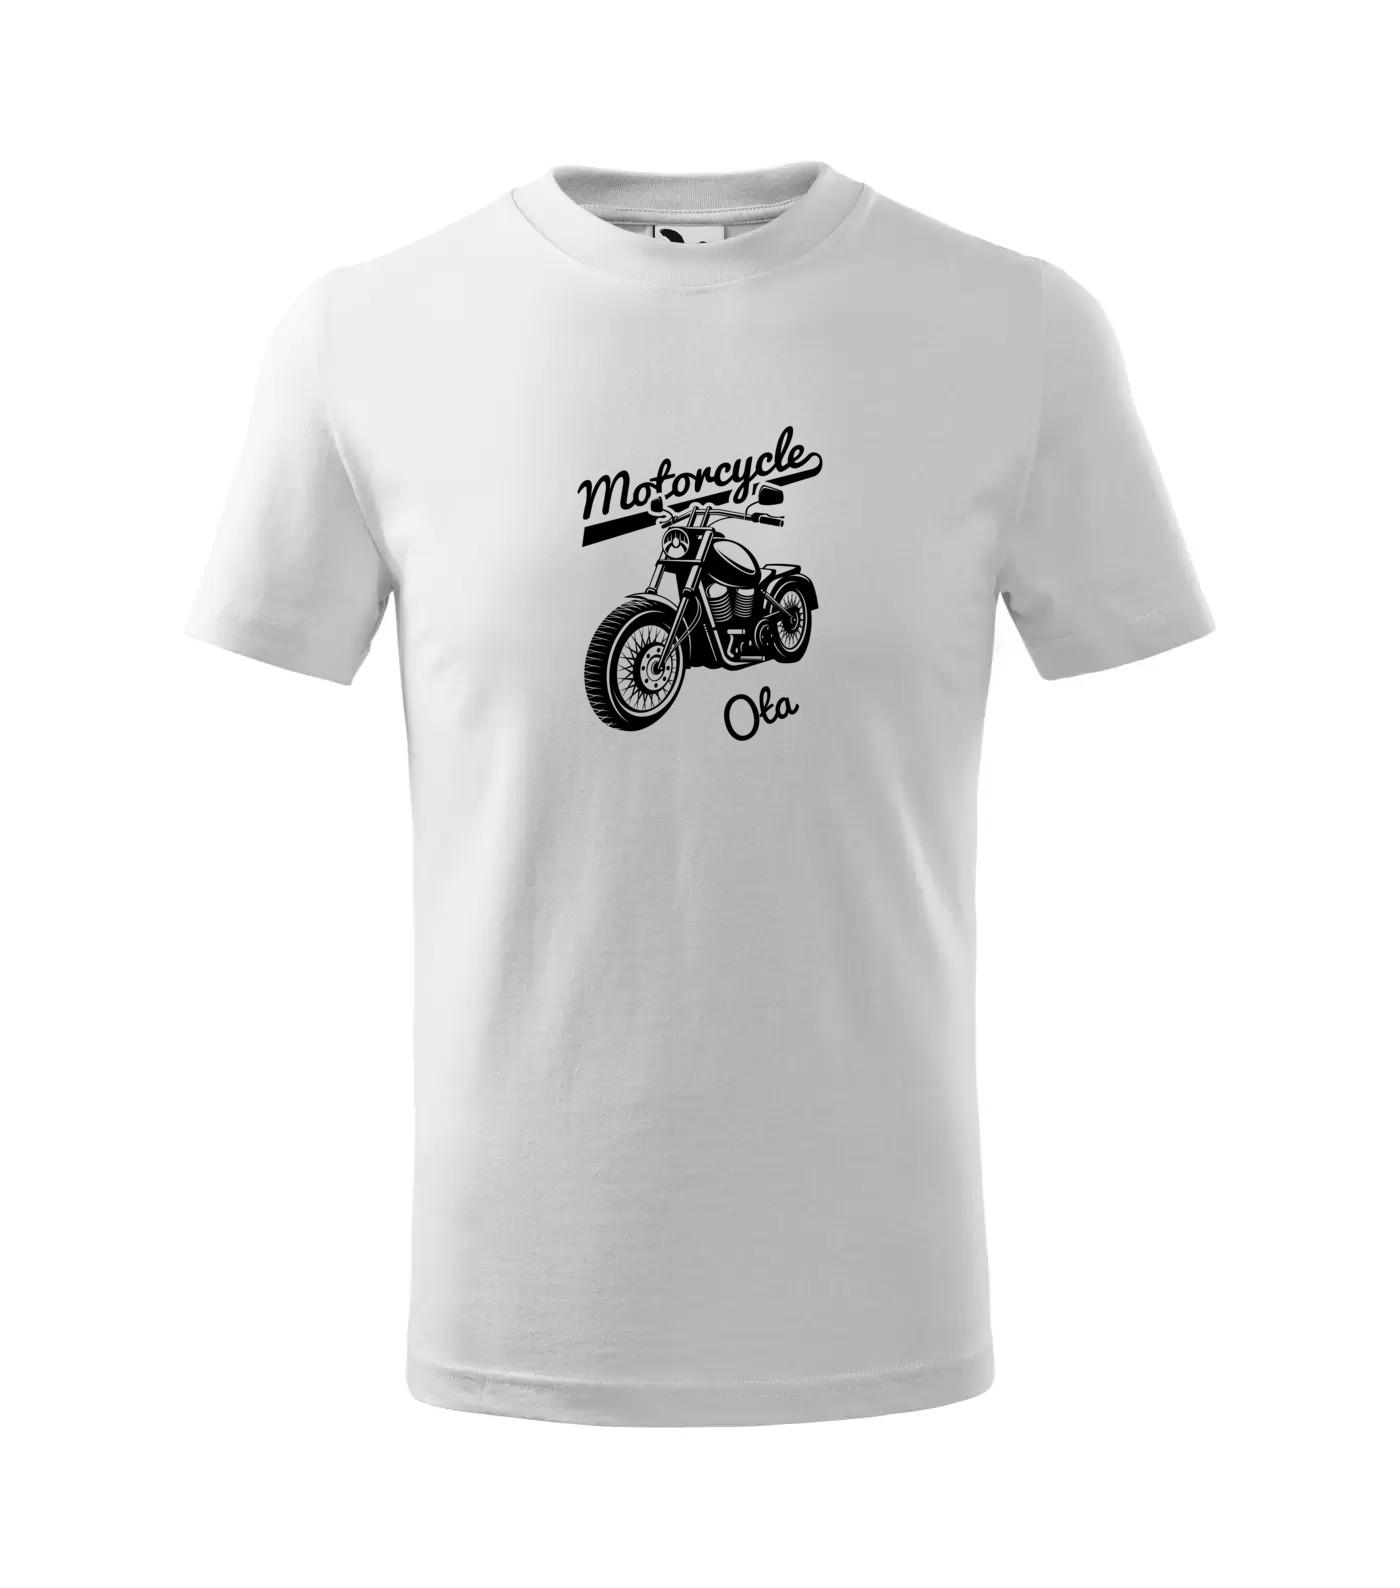 Tričko Motorkář Inverse Ota